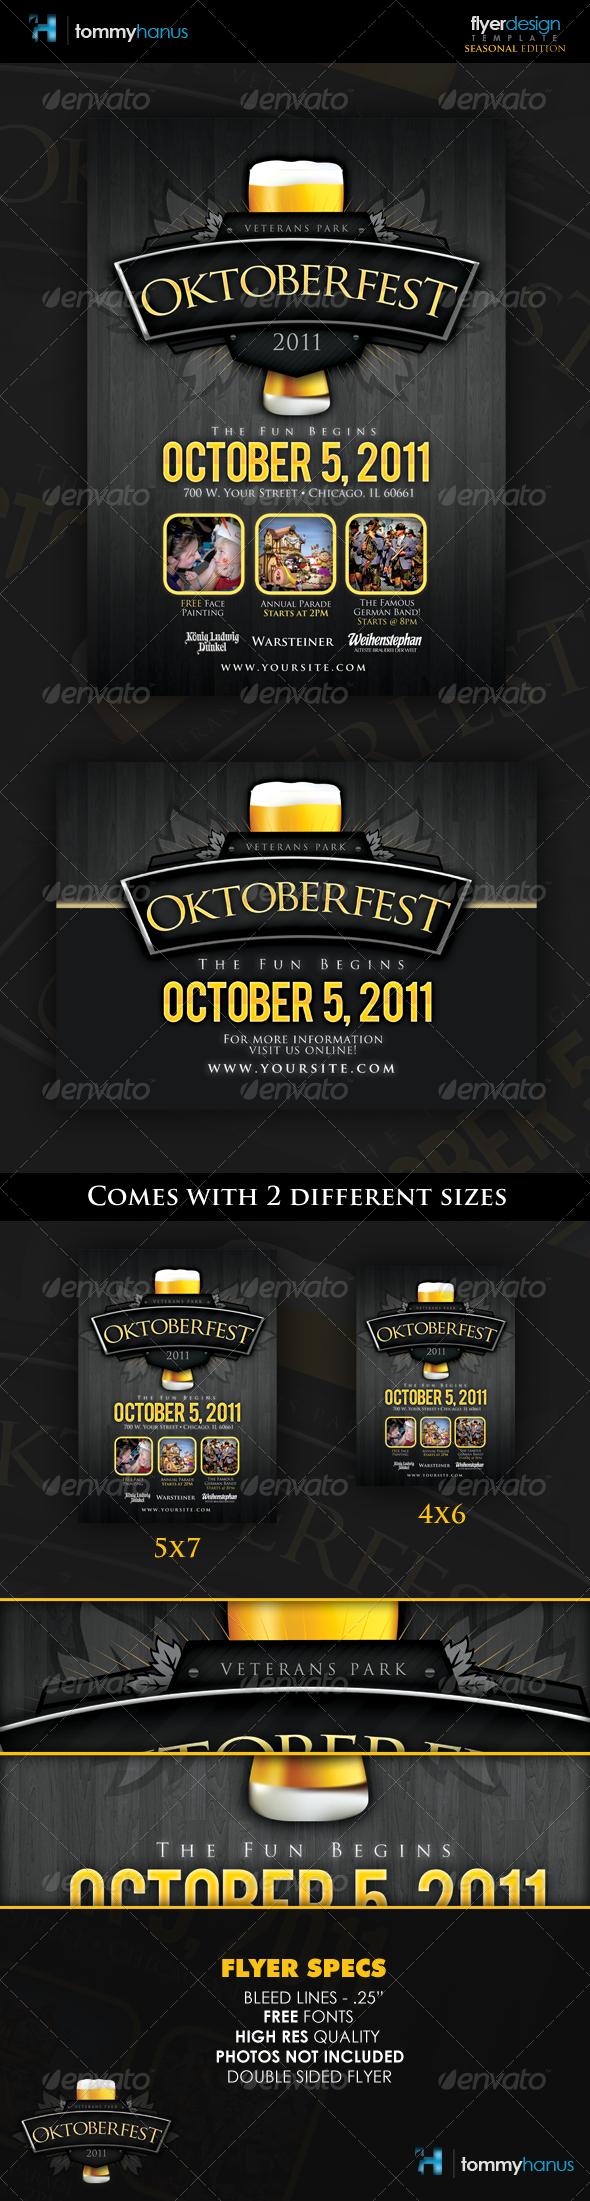 Oktoberfest Event Flyer Template - Holidays Events